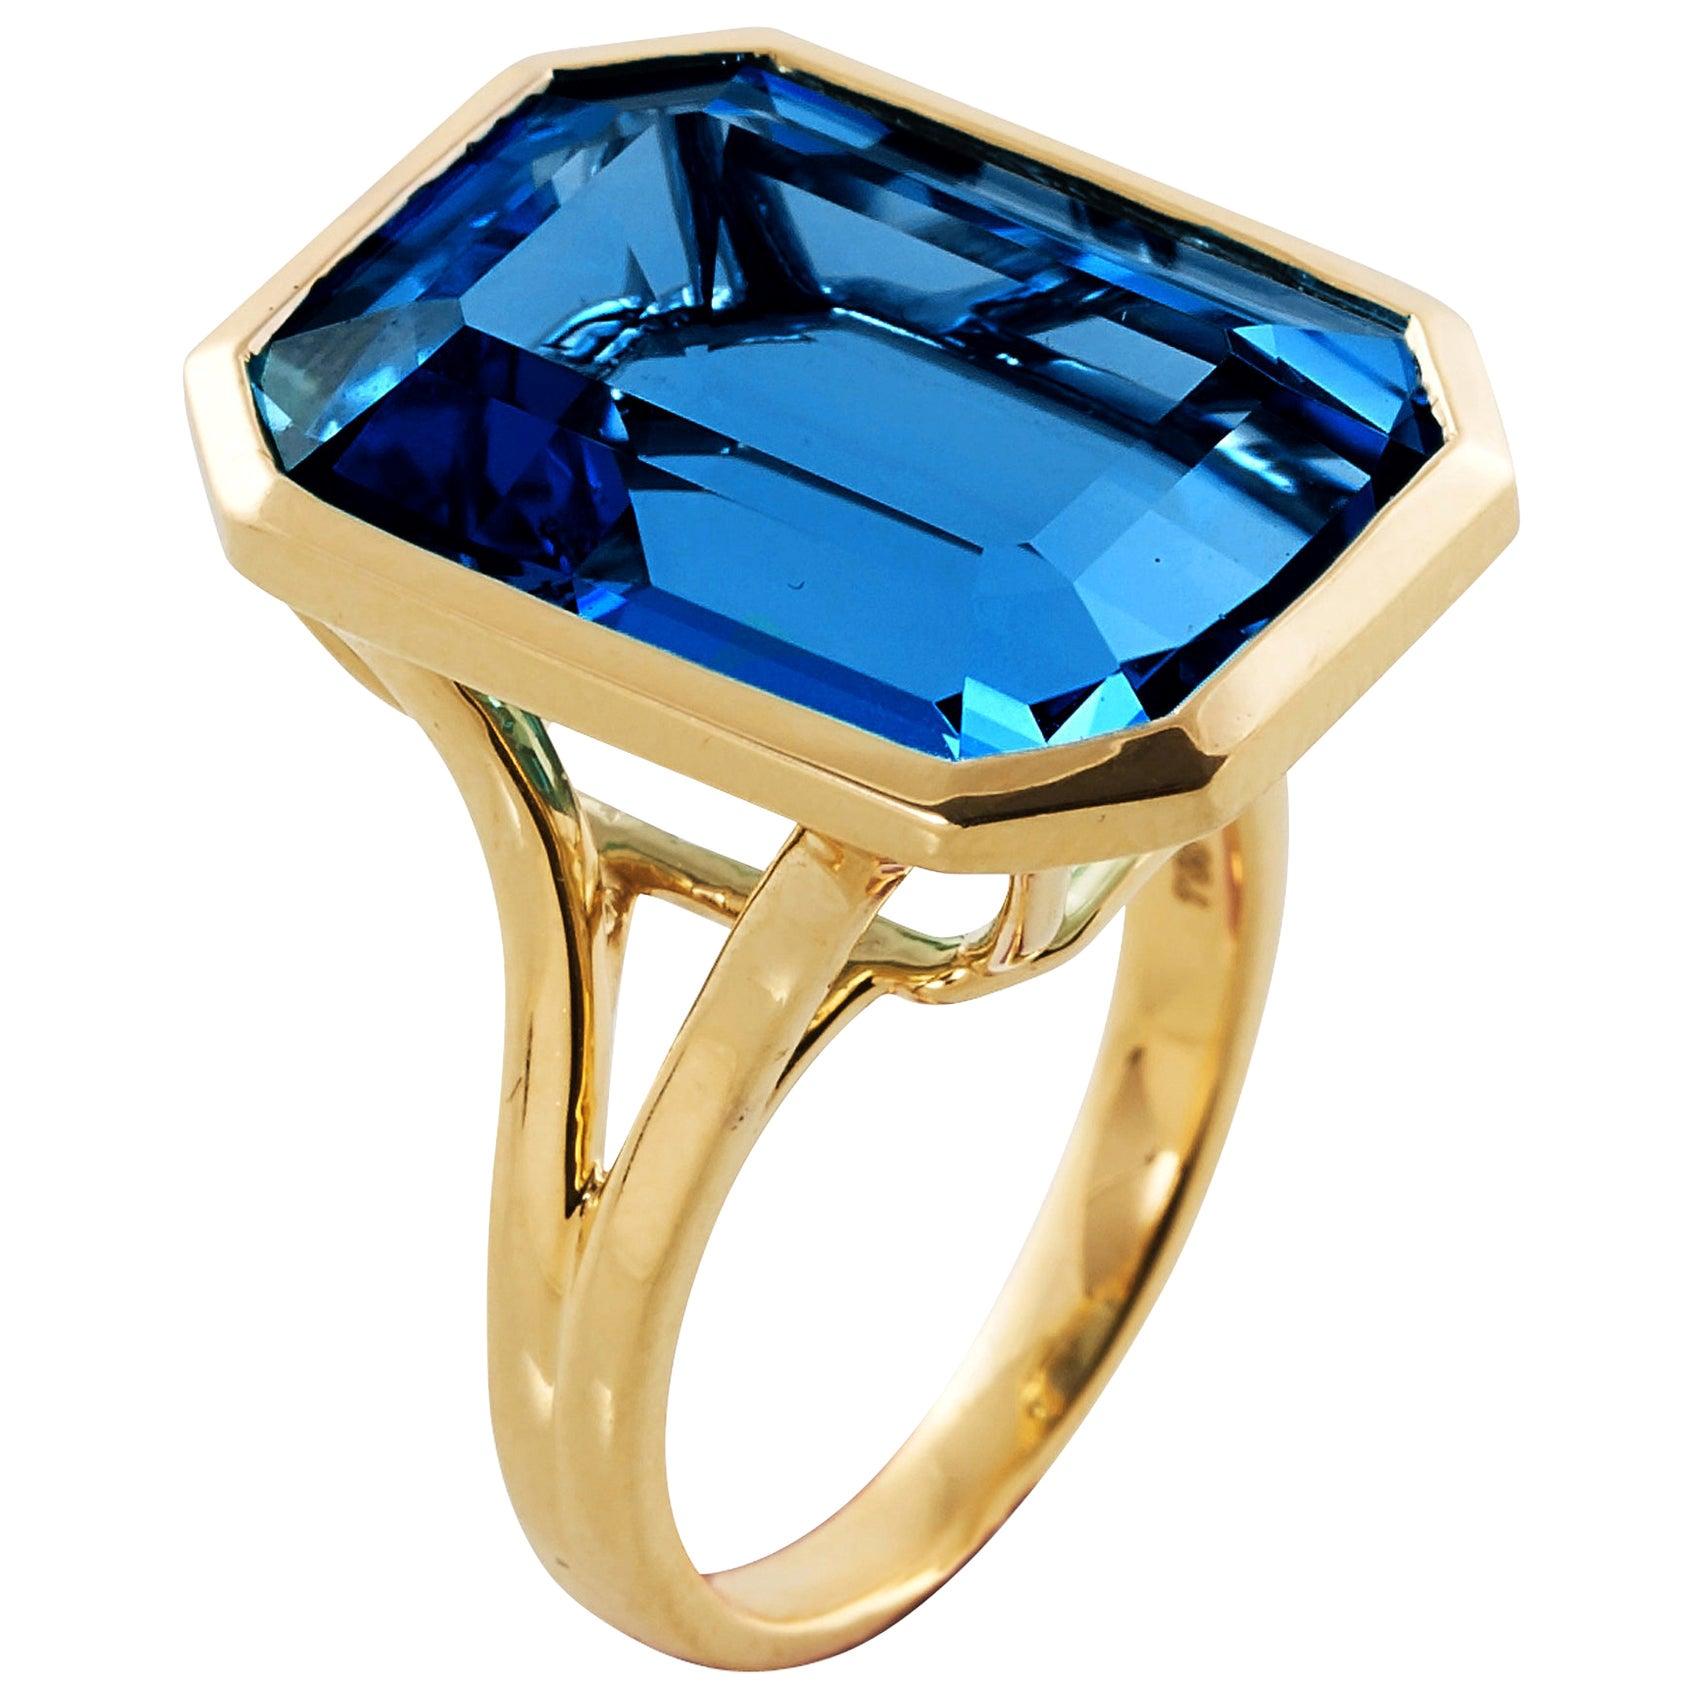 Goshwara Emerald Cut London Blue Topaz Ring